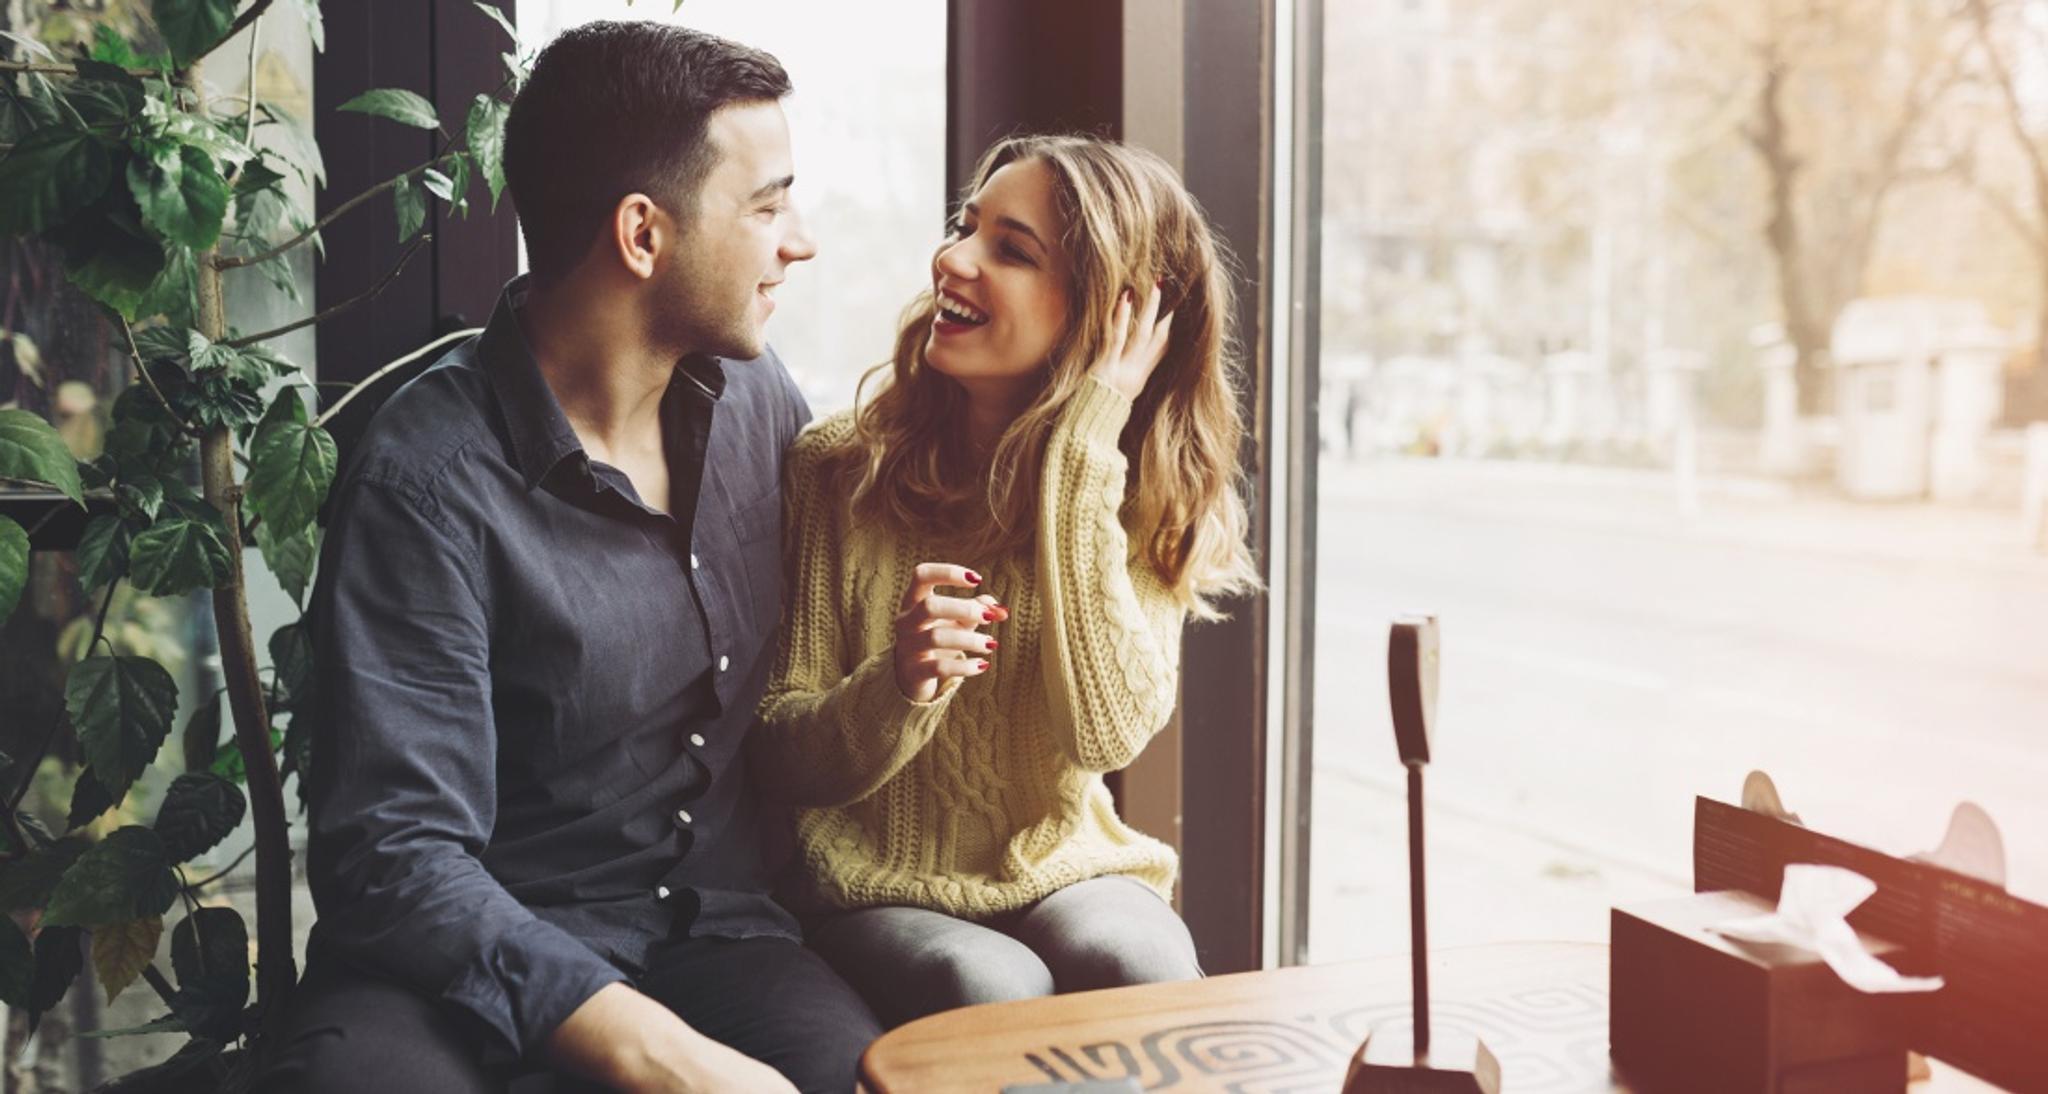 UK rento dating sites